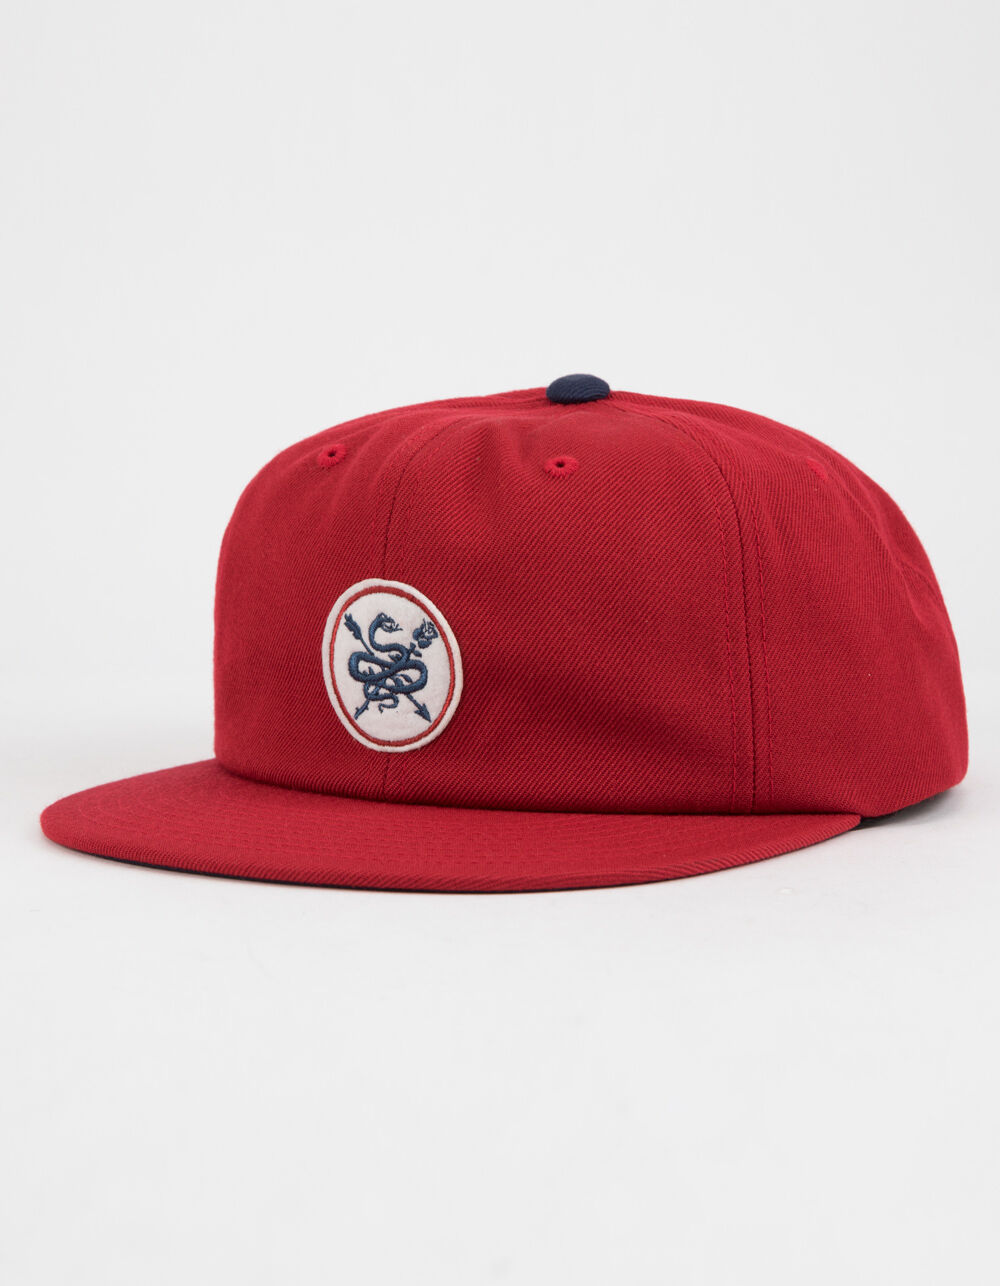 PRIMITIVE Serpent Black Snapback Hat